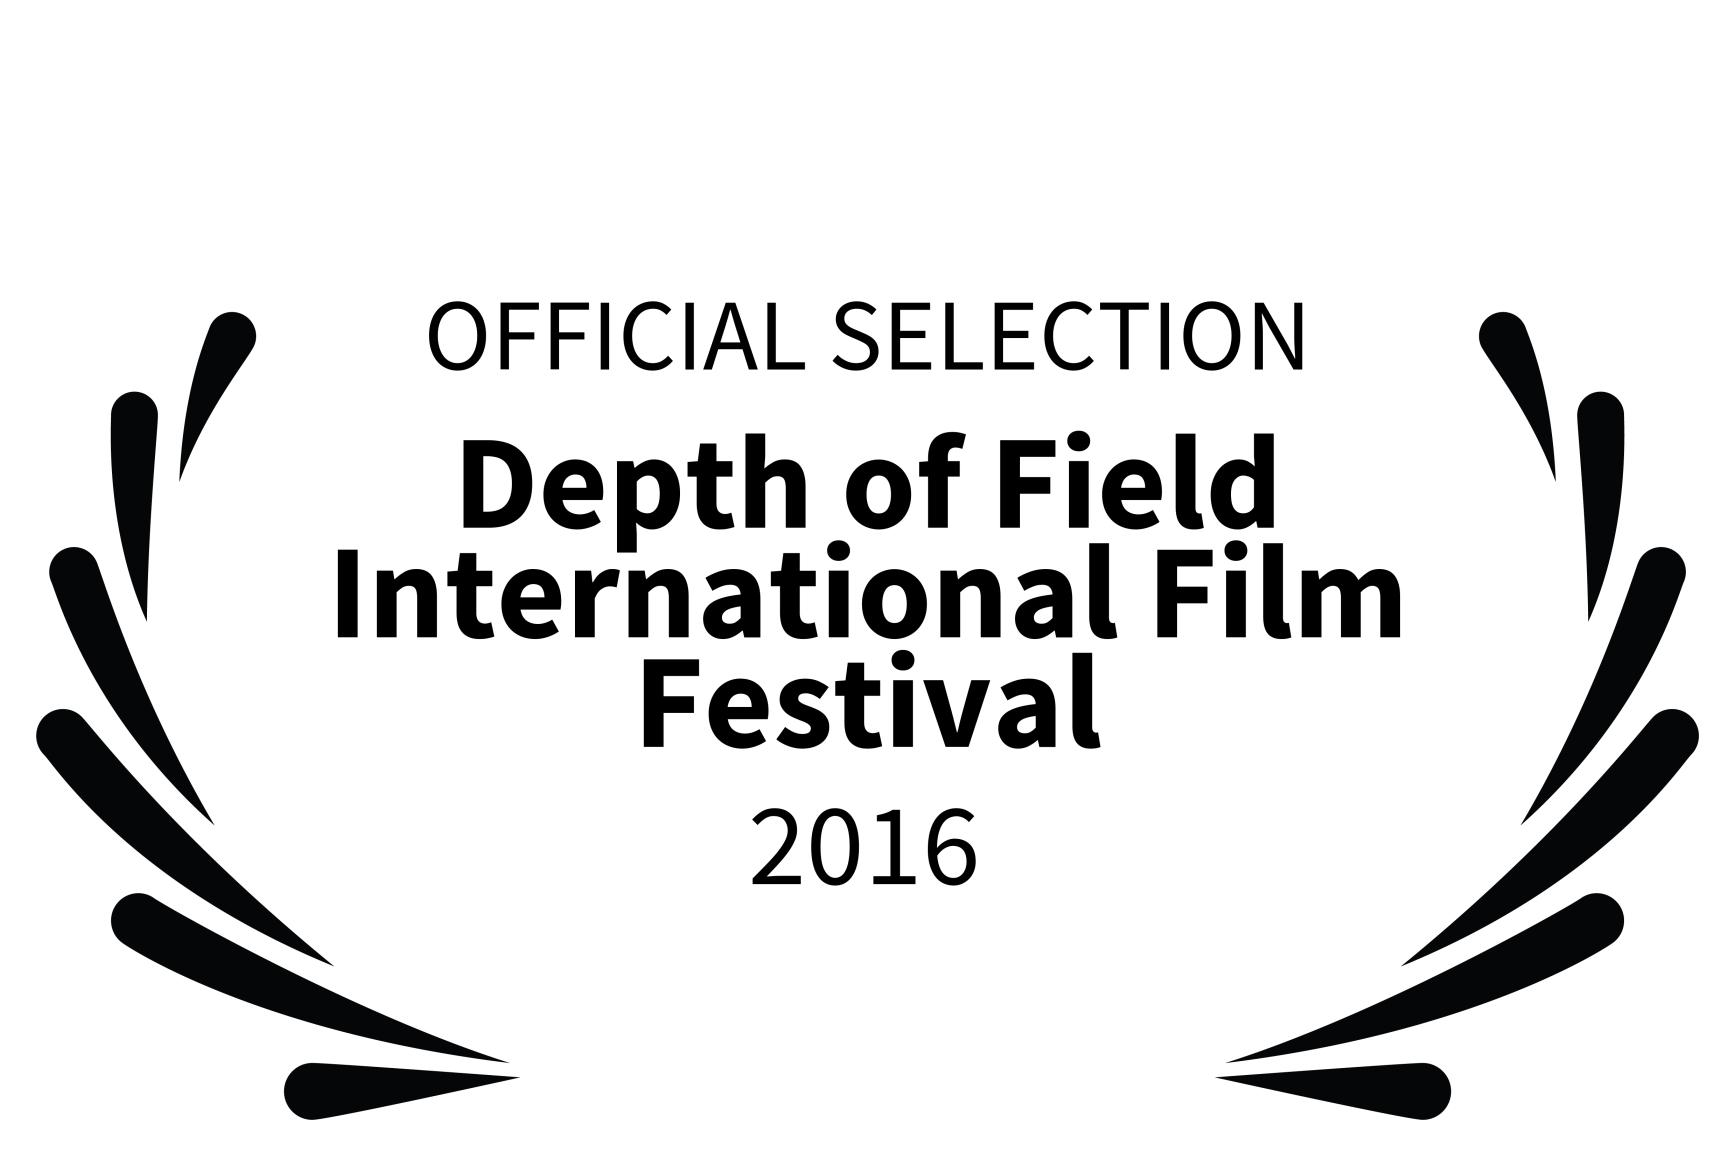 Depth of Field International Film Festival 2016.jpg